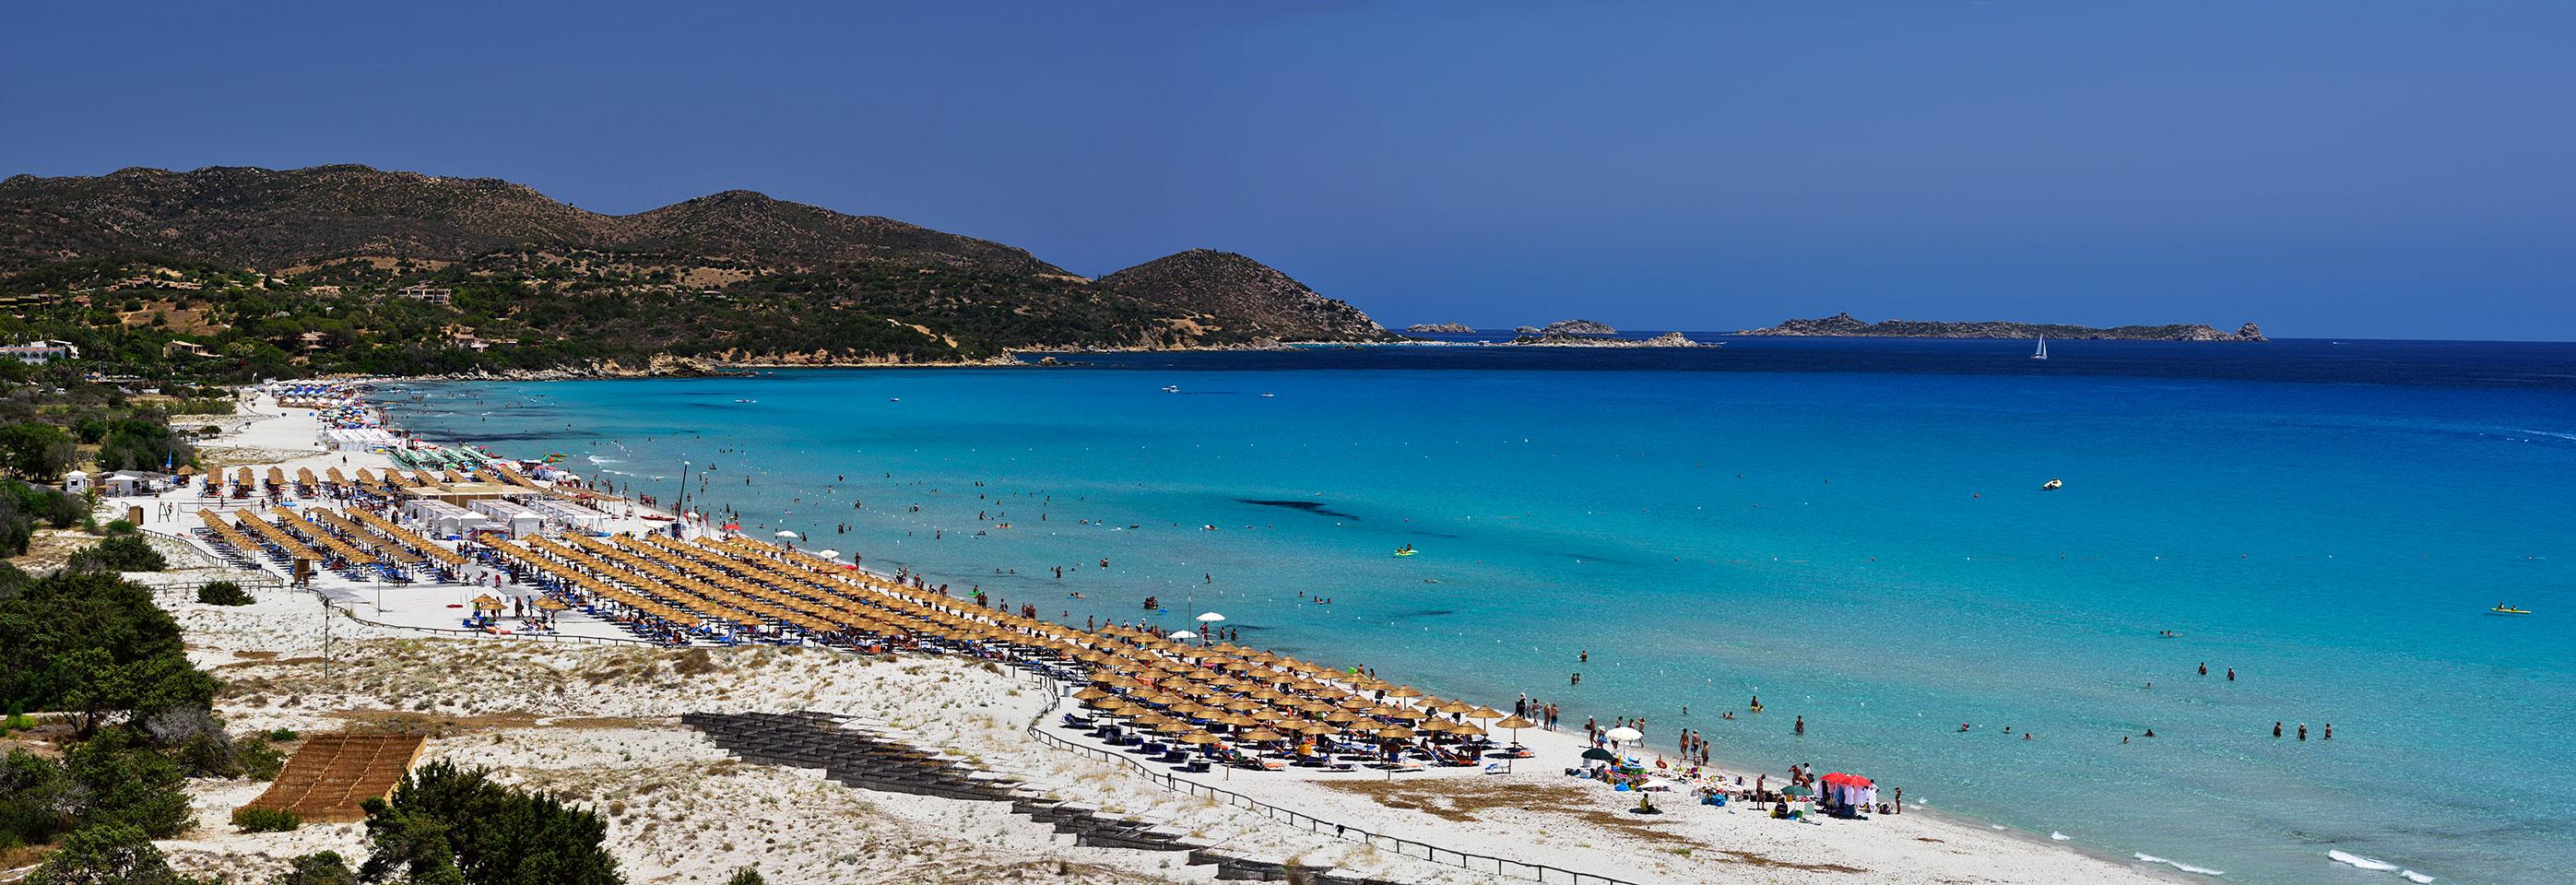 Offerte VOI Tanka Resort con Nave Gratis - Villasimius - Sardegna.com